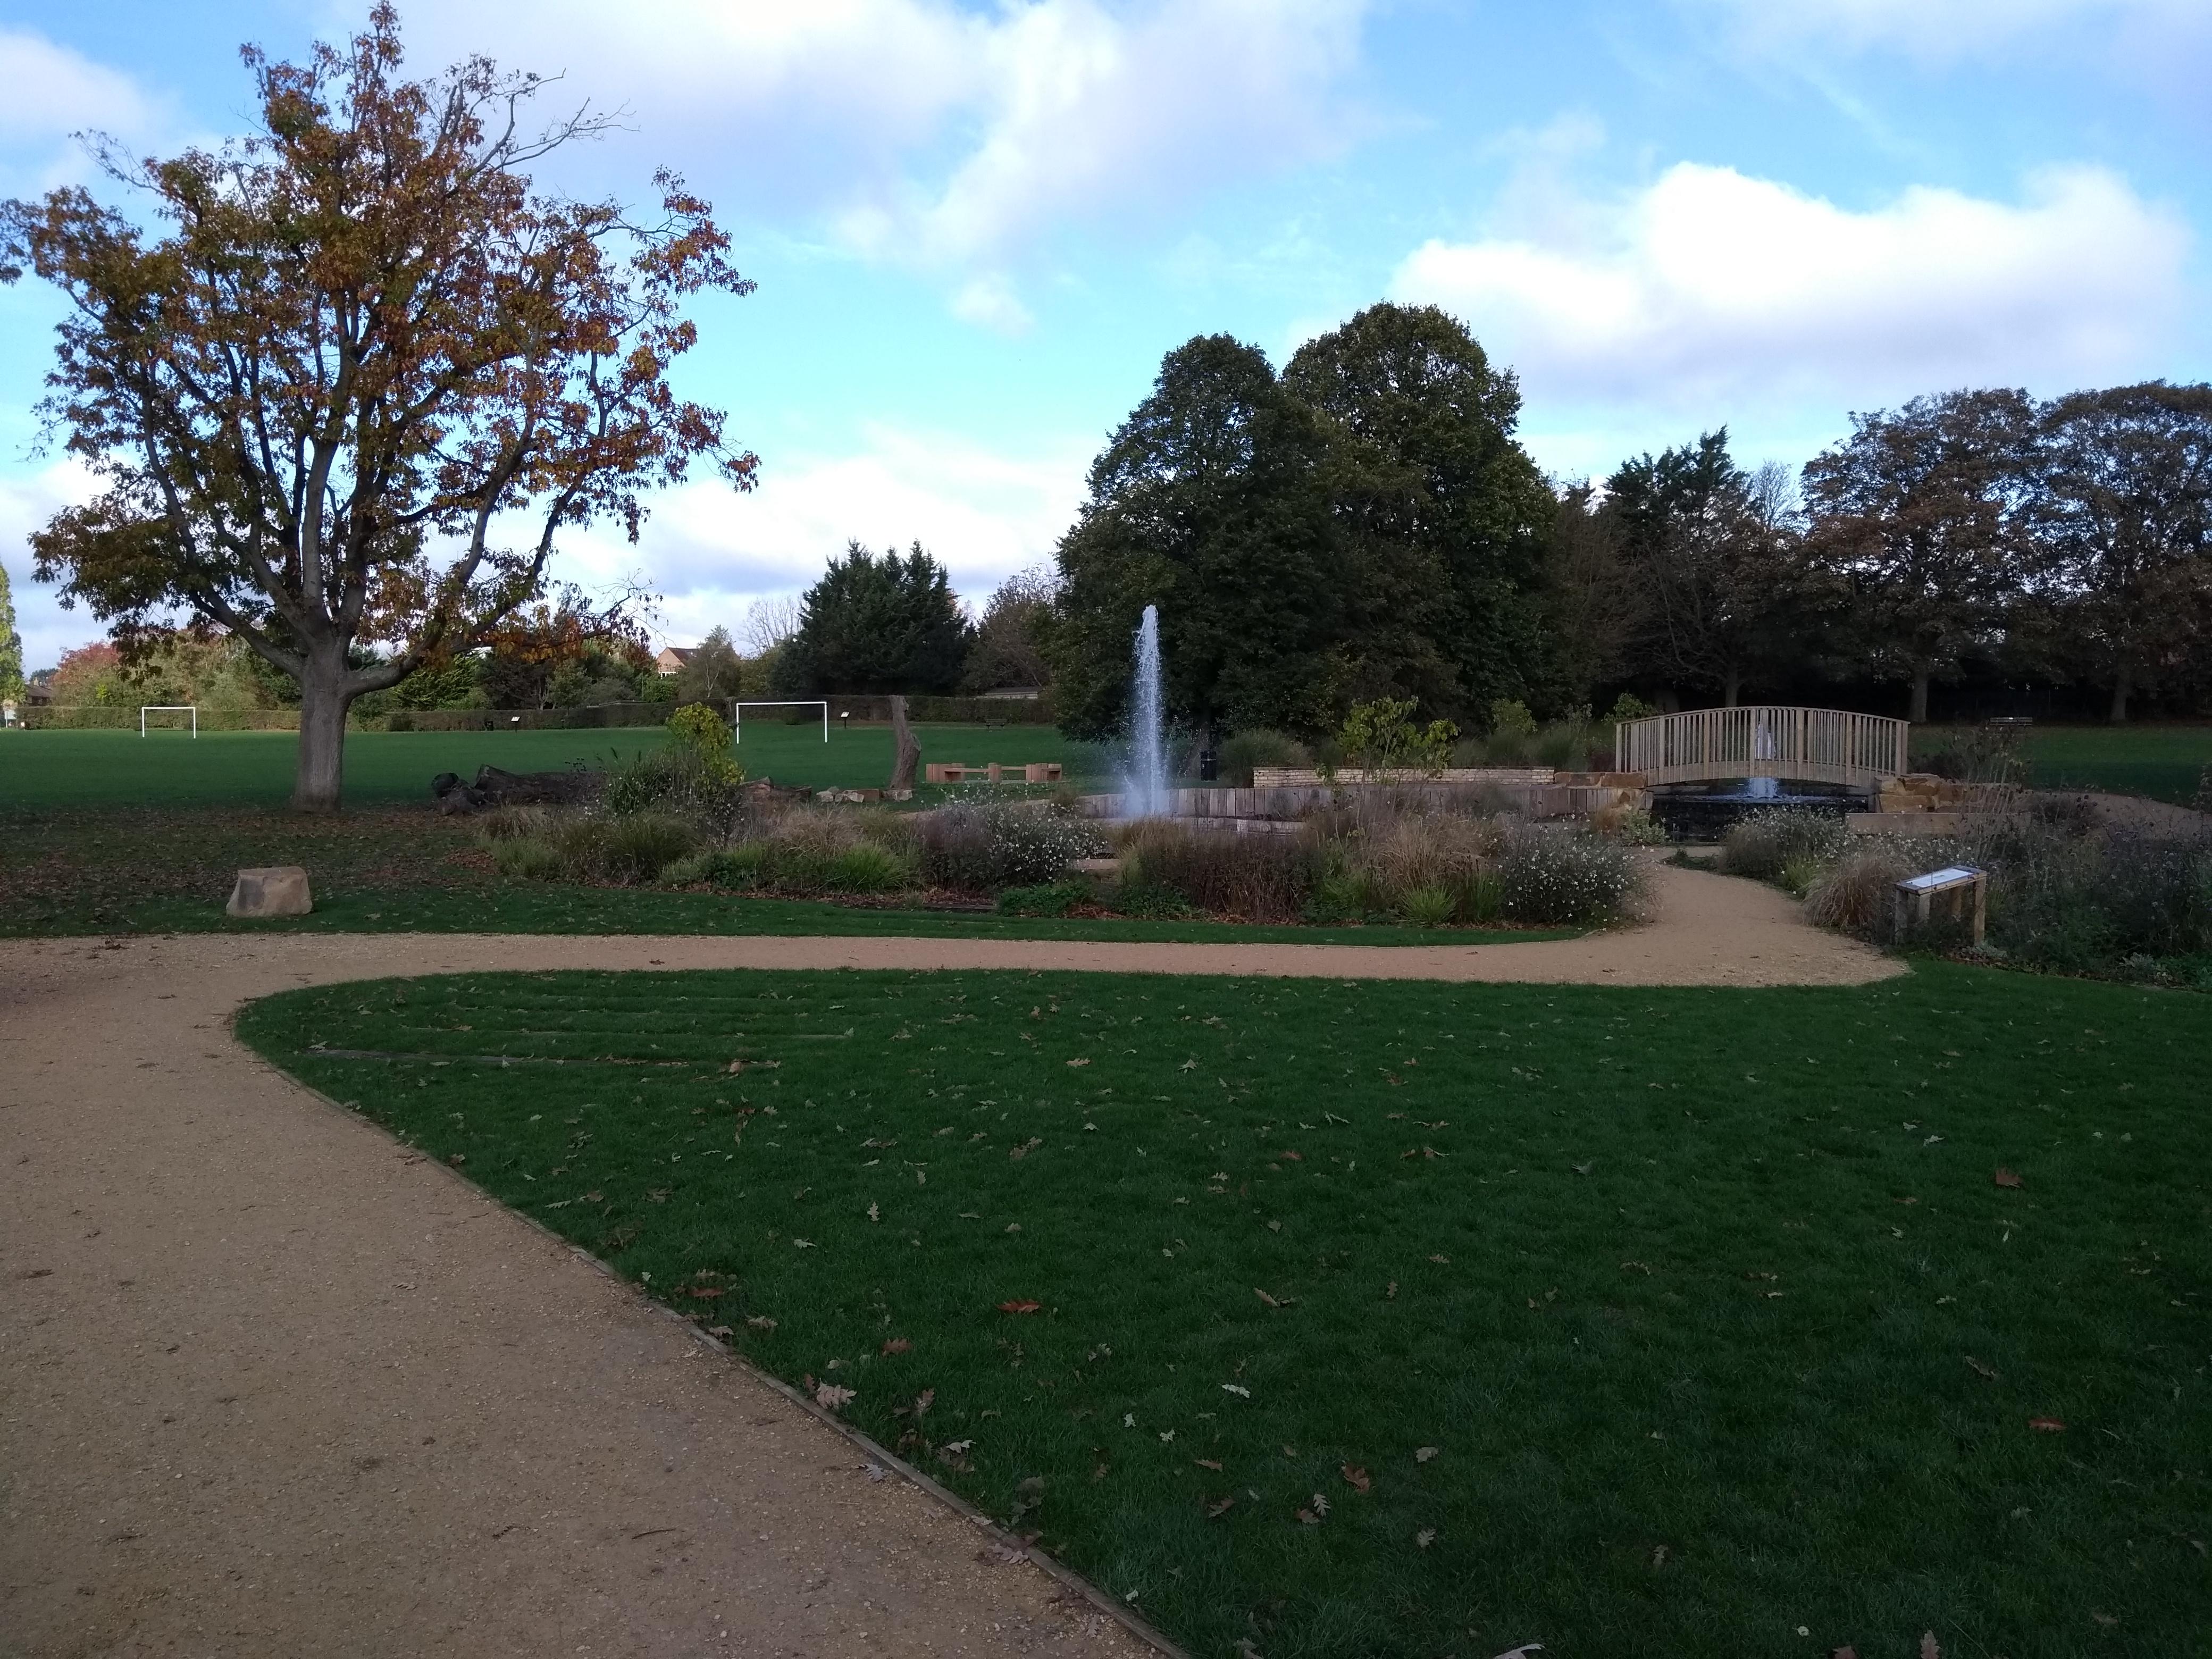 Sir Nicholas Winton garden